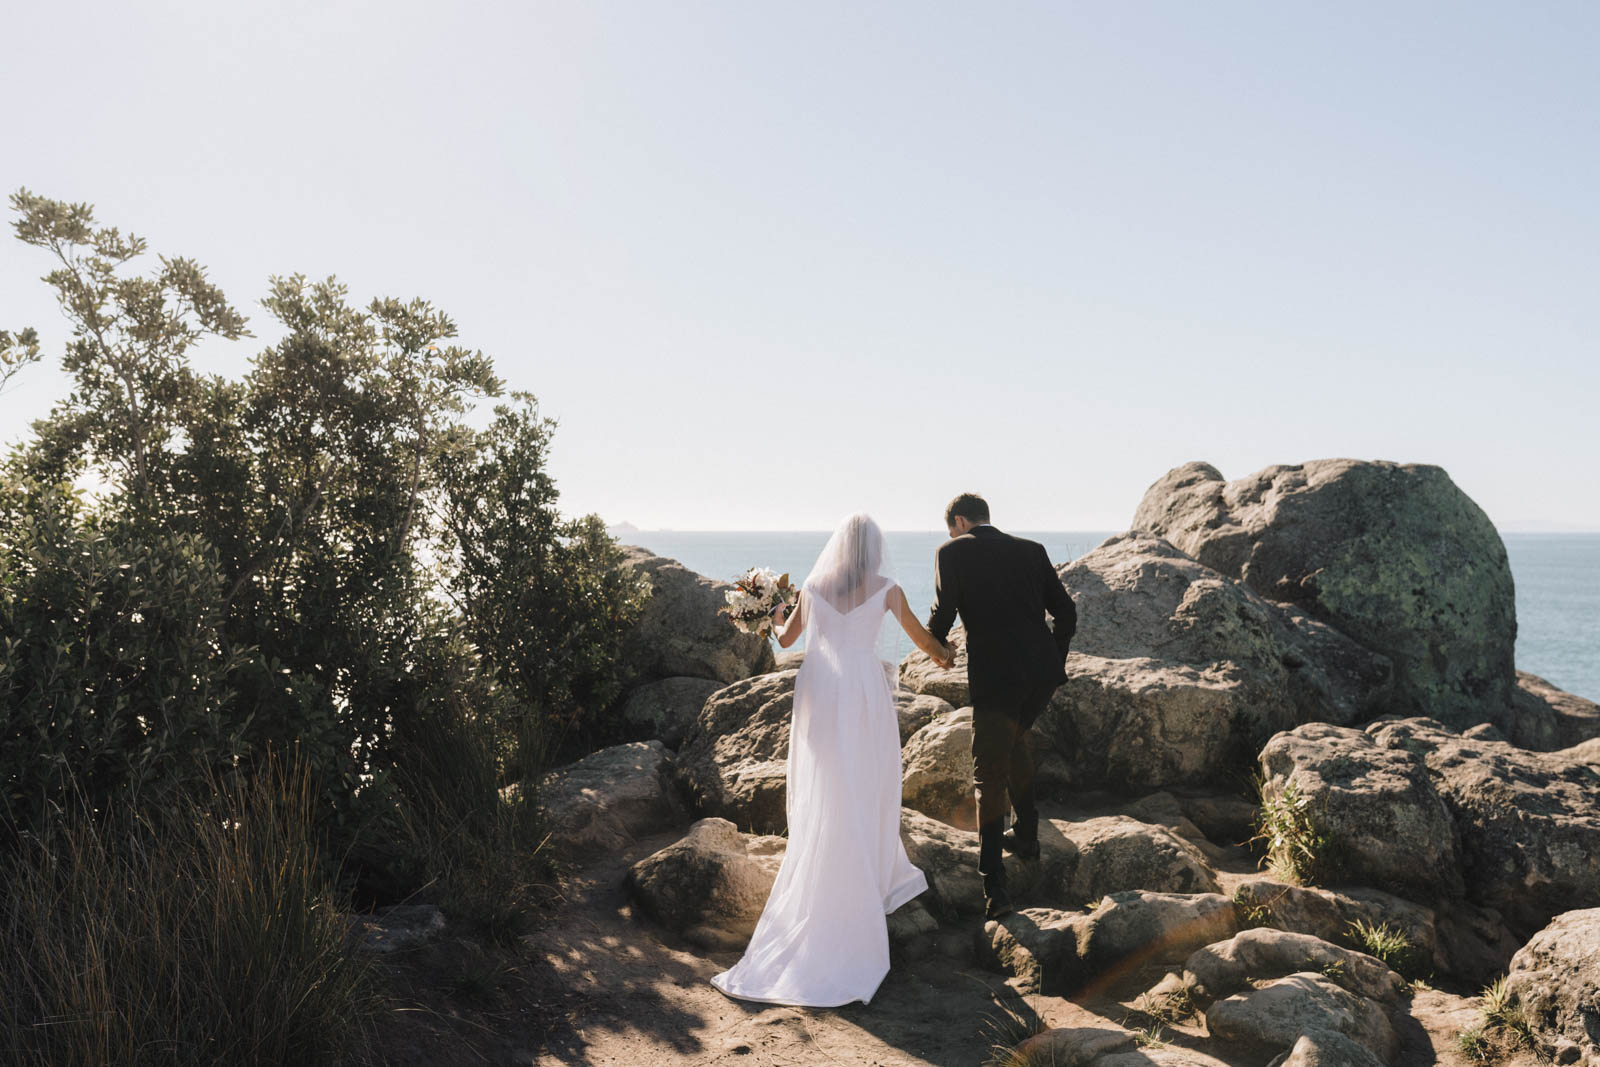 newfound-s-p-mt-maunganui-tauranga-wedding-photographer-1531-LQ109690